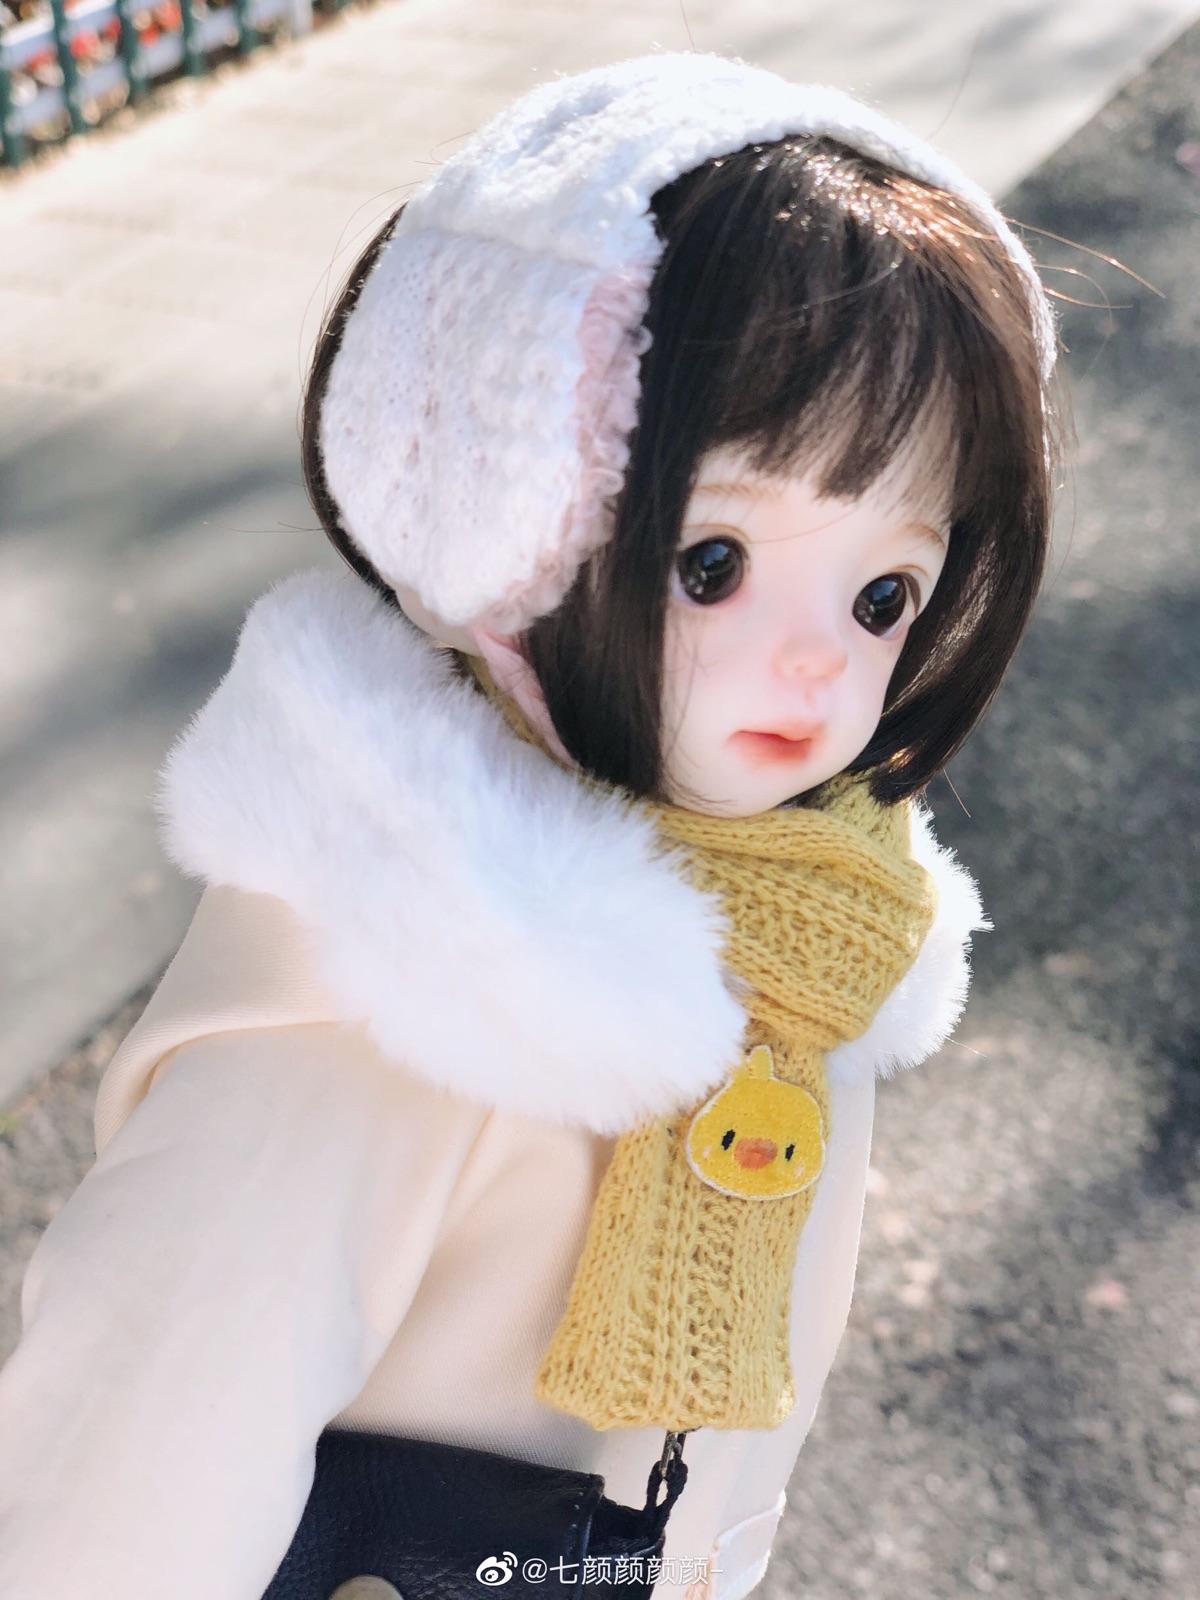 Spot bjd6 points 1 / 6 baby clothes accessories headwear warm winter earmuffs